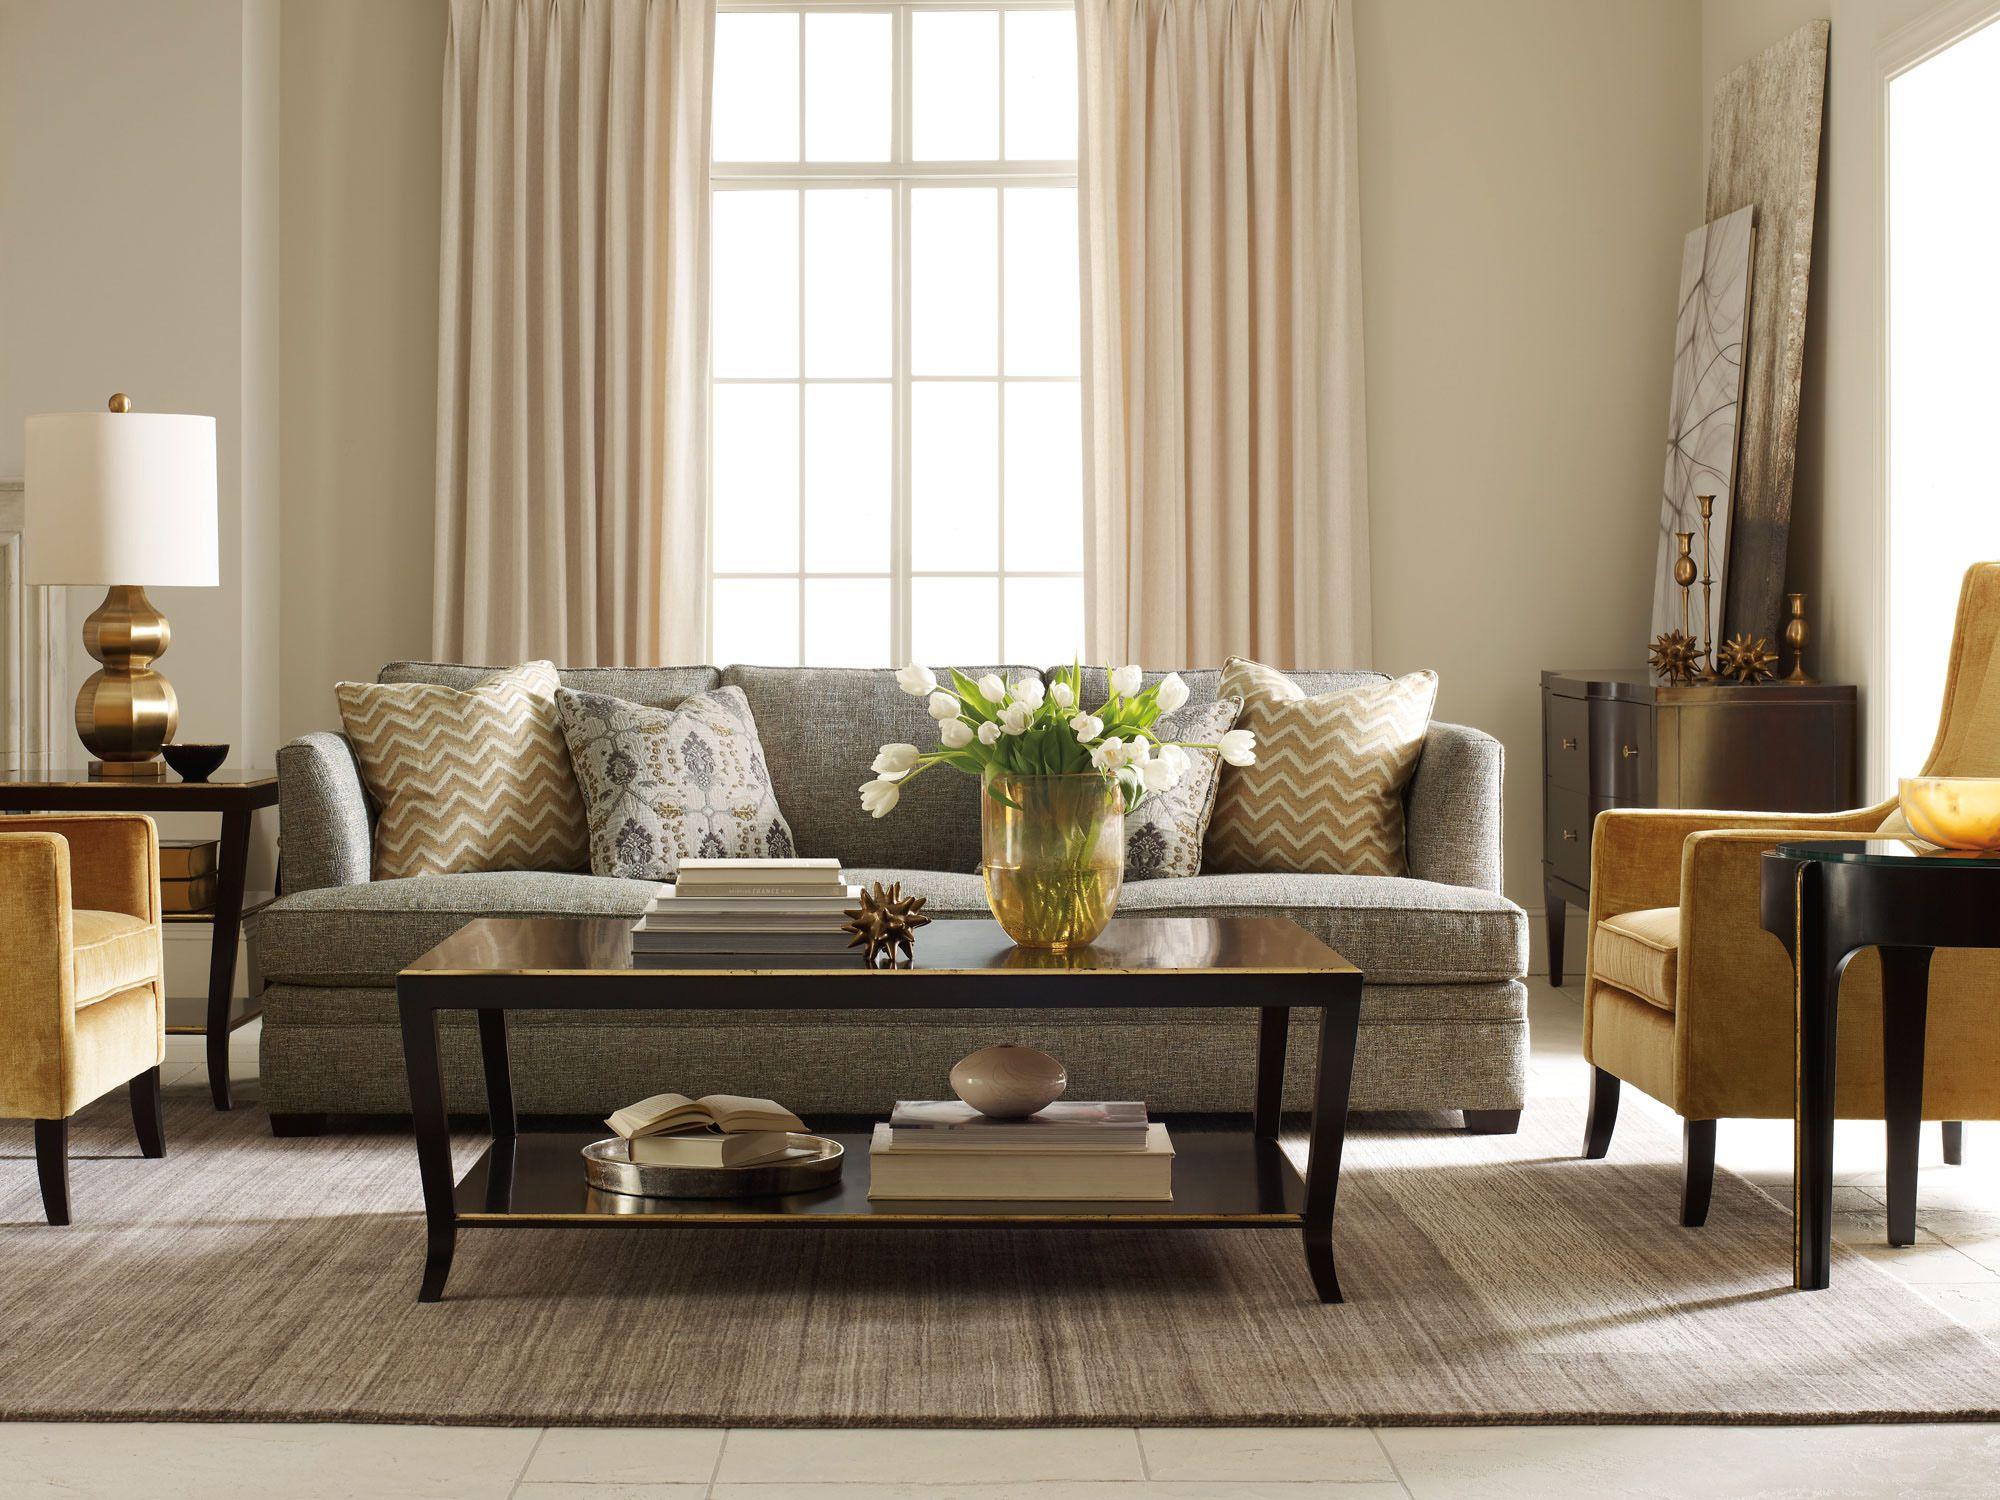 Grantham Conway Mayfair Living Room Bernhardt Eriks Like The Gold